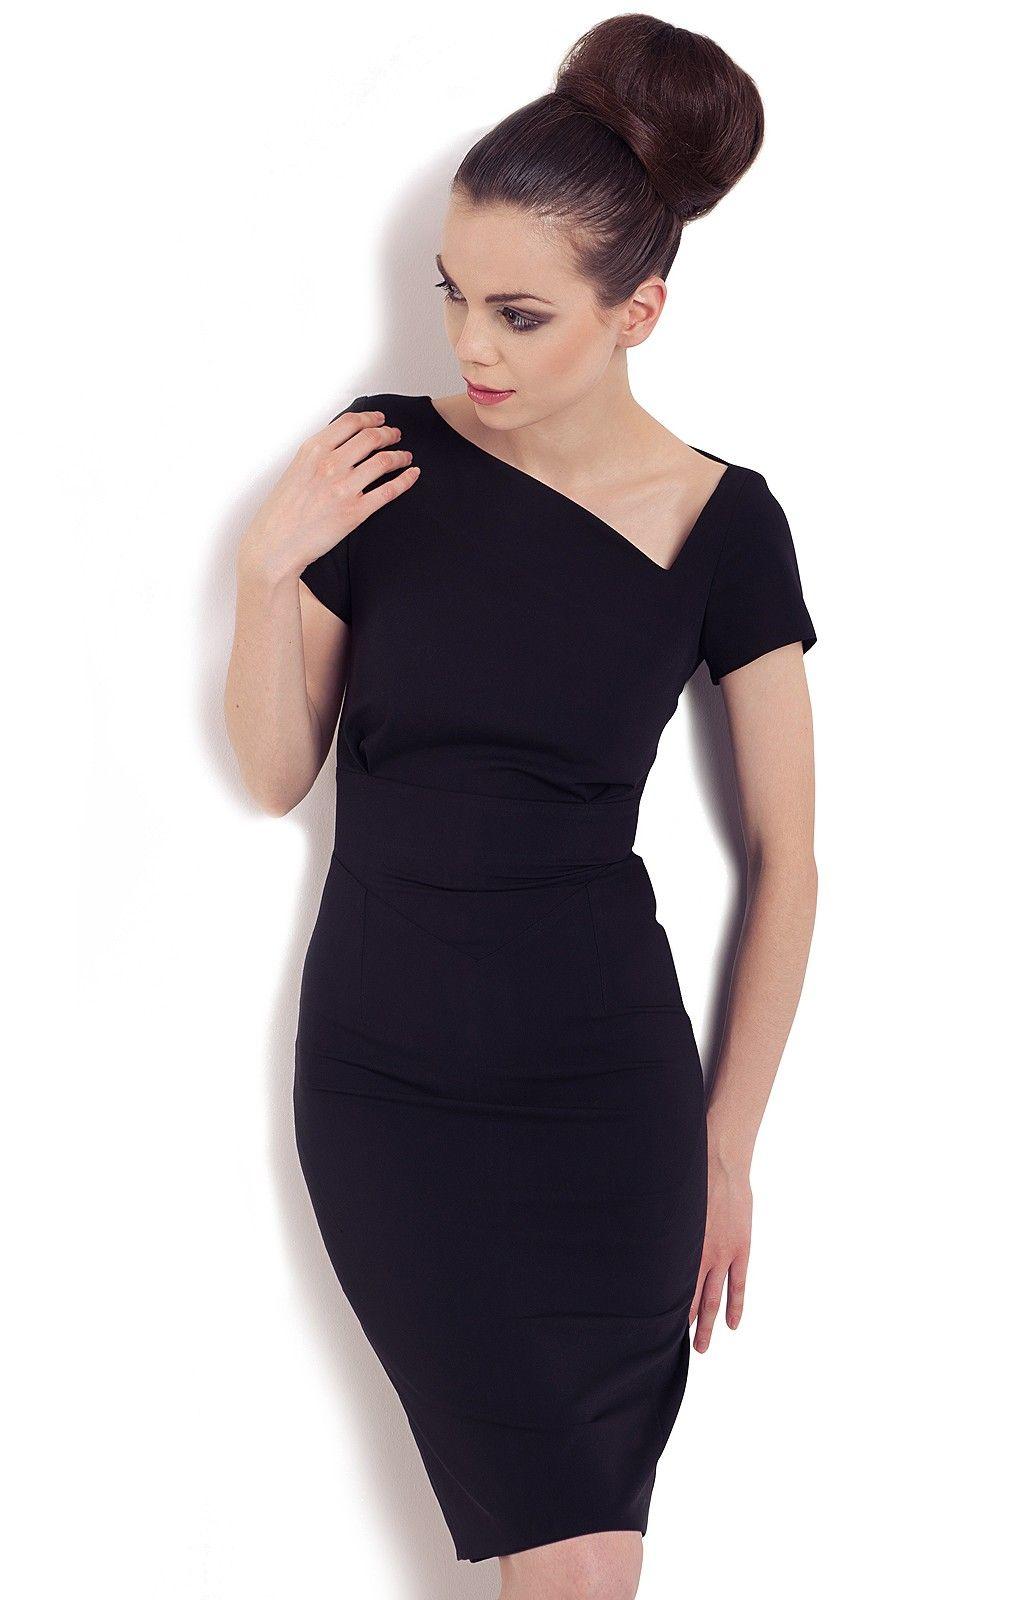 Notre gamme de robes - idresstocode. Robe FourreauRobe NoirePetite ...